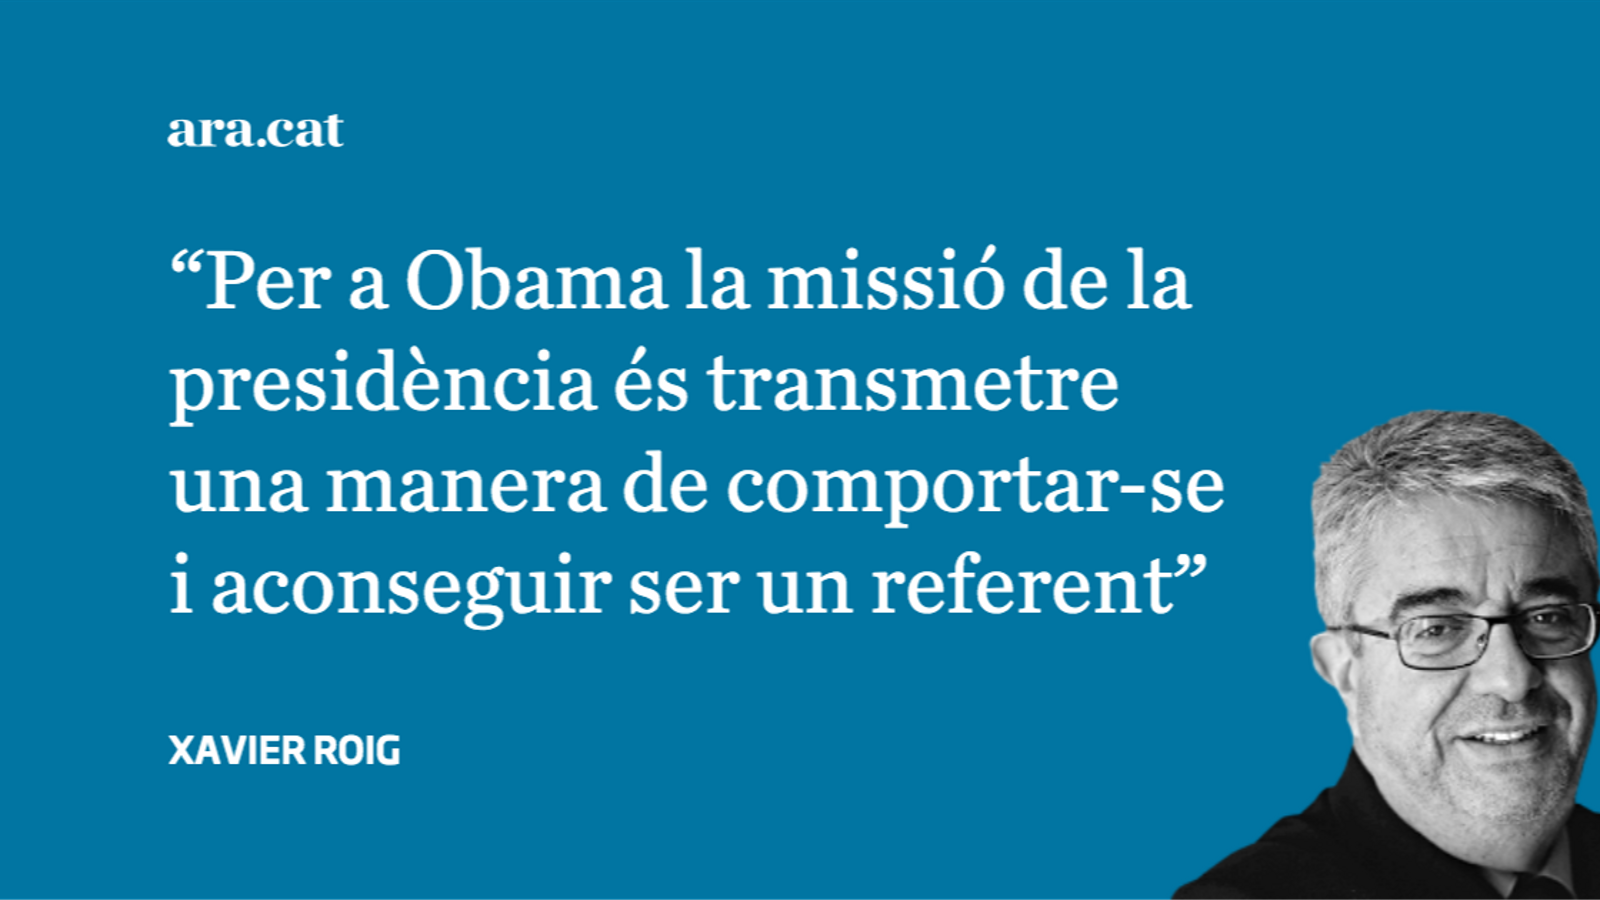 Encara Obama: dues reflexions